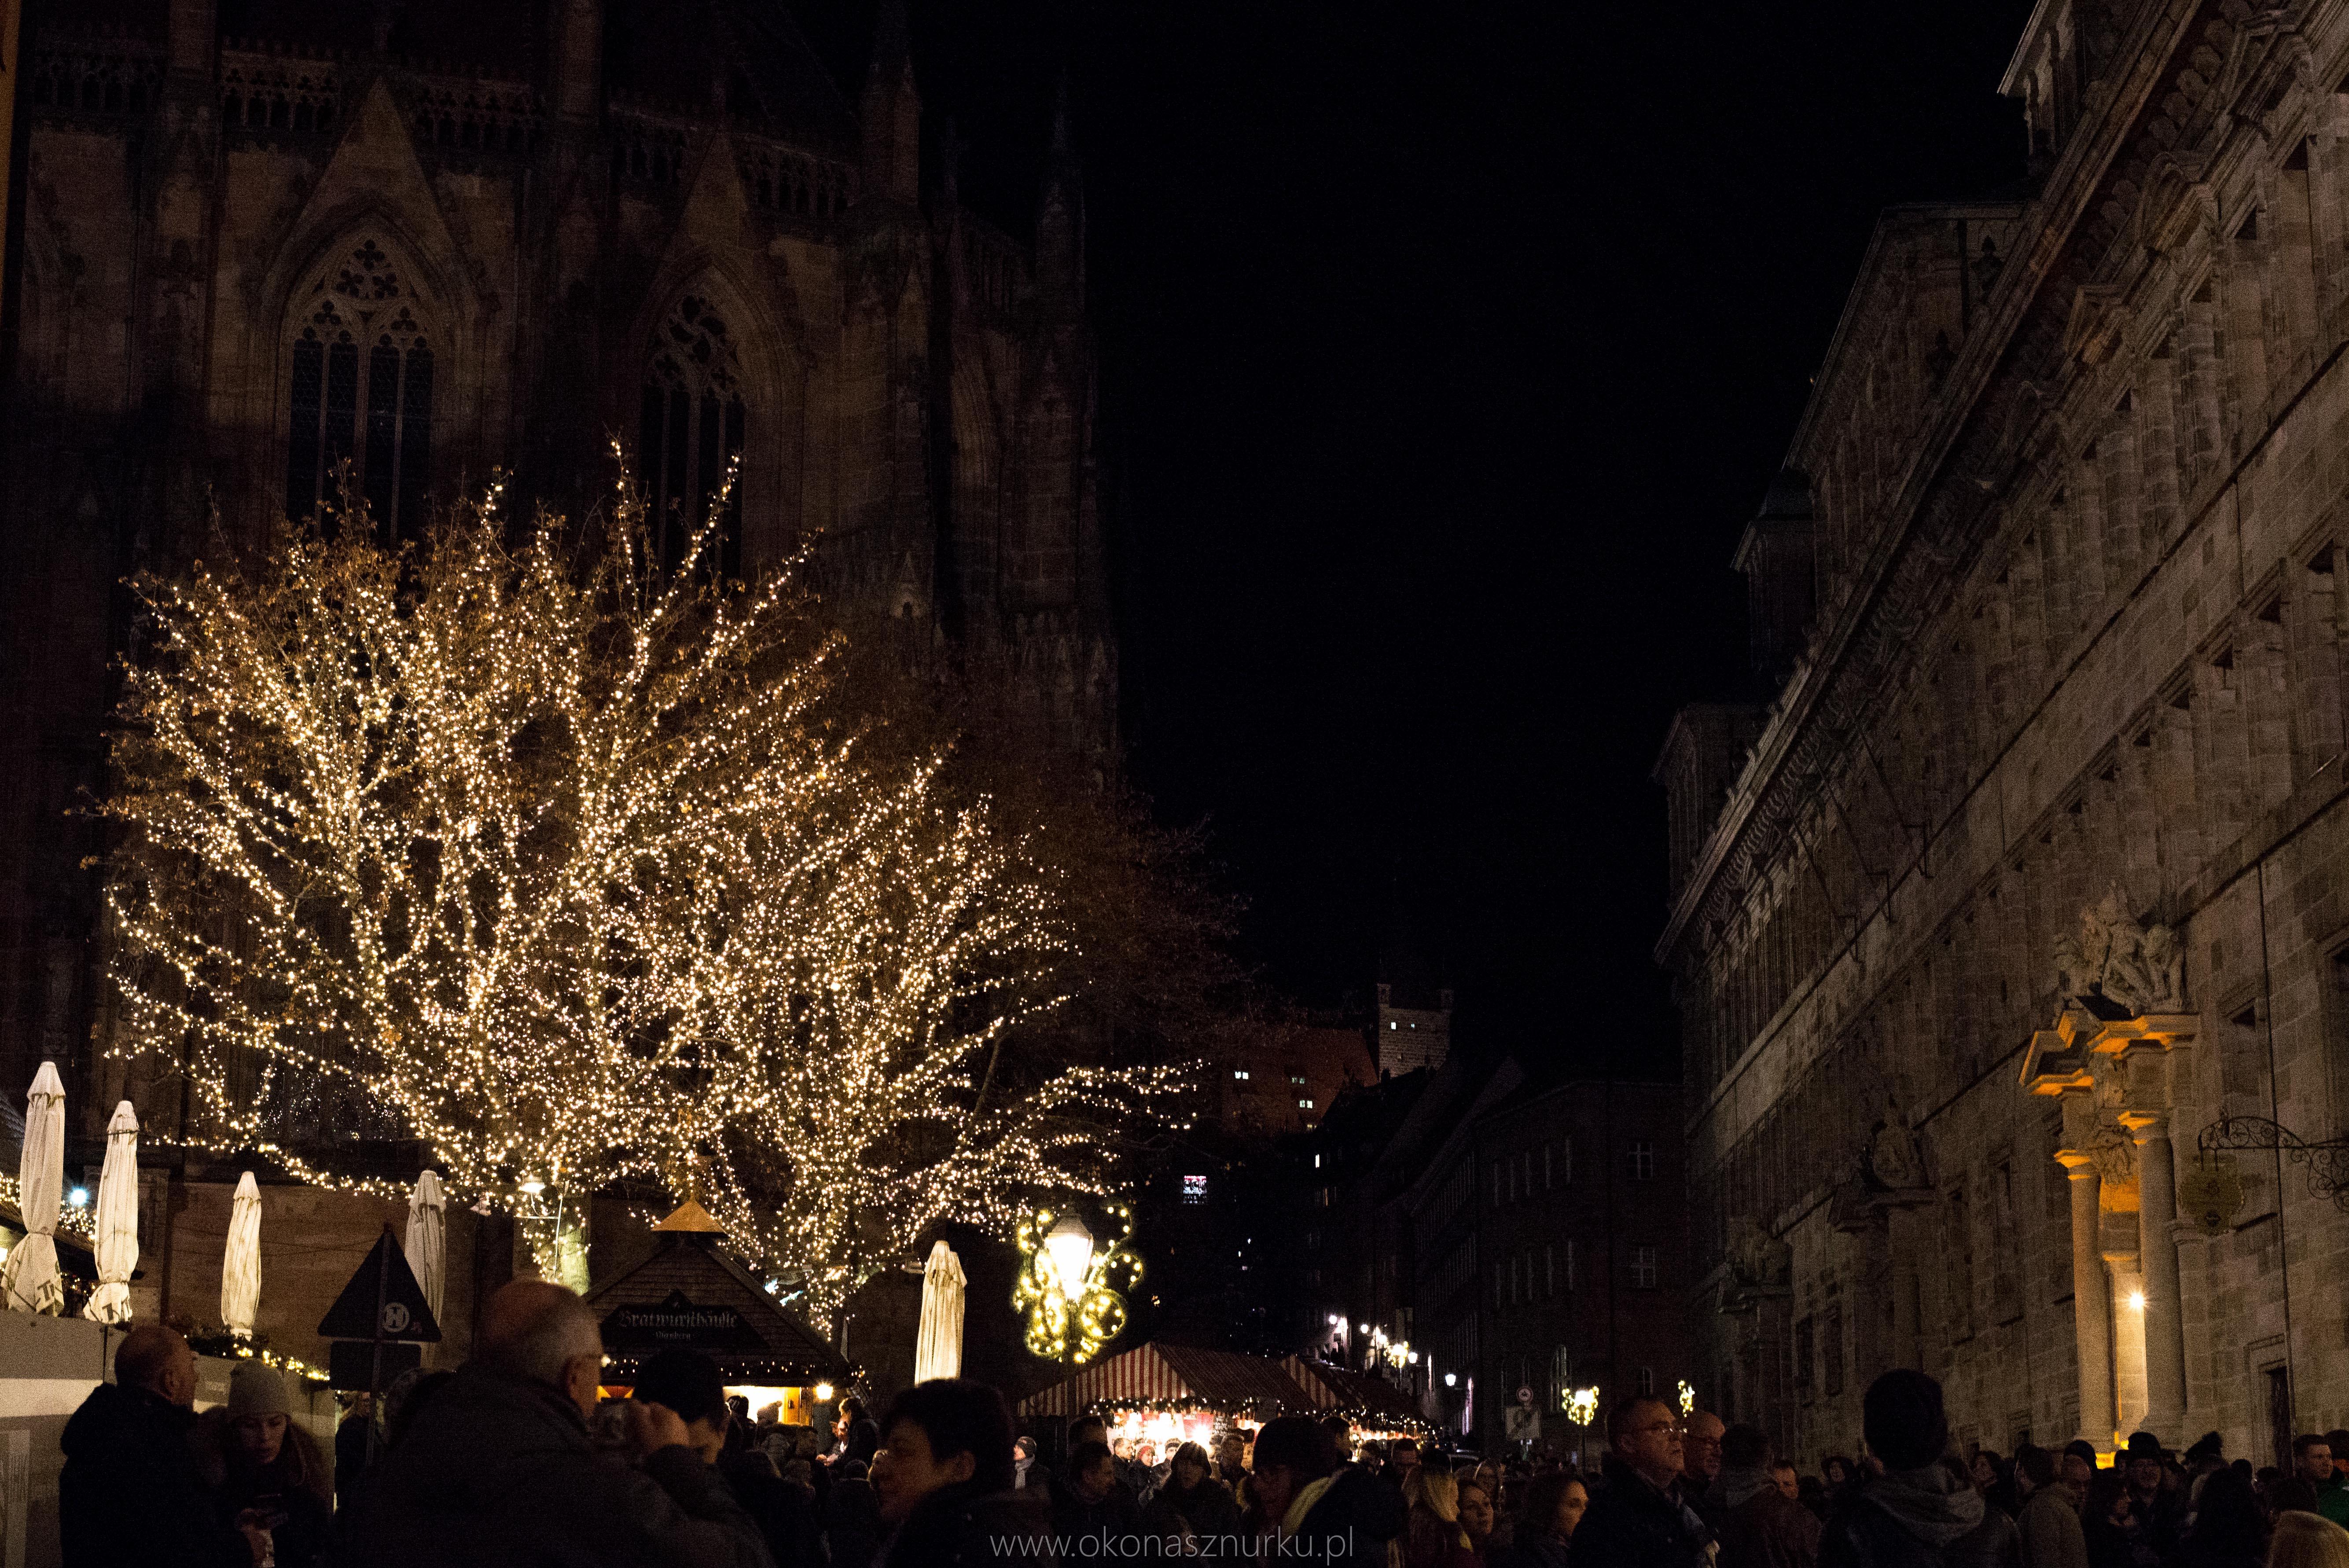 Nürnberg-stadt-norymberga-bayern-city-frankonia (26)